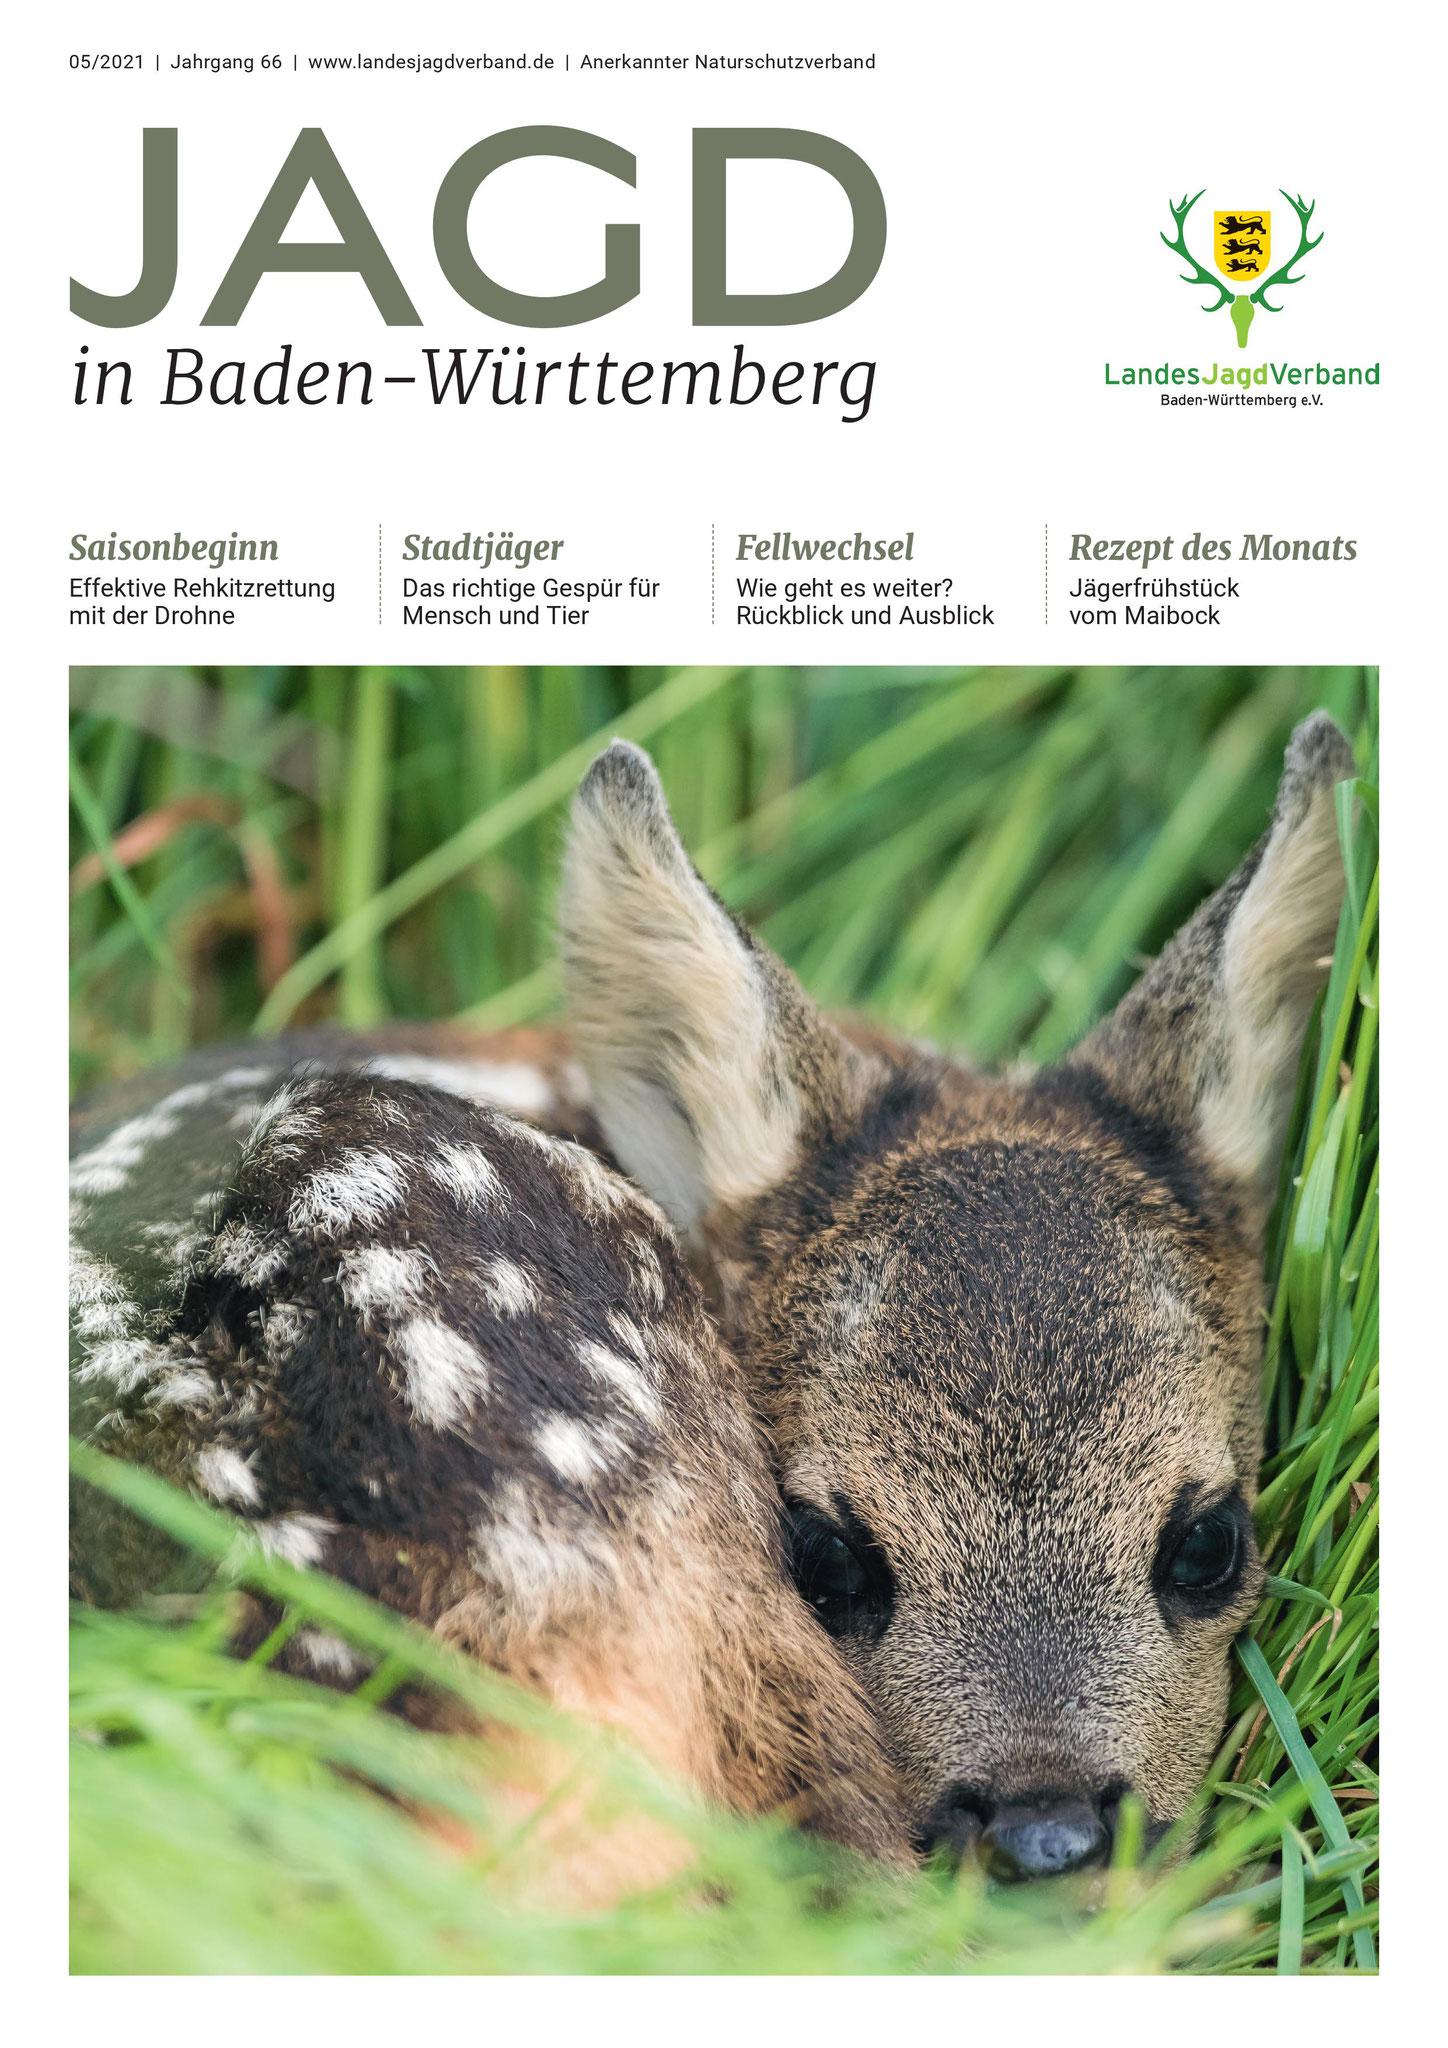 Titelseite der Jagd in Baden-Württemberg Nr. 5/2021